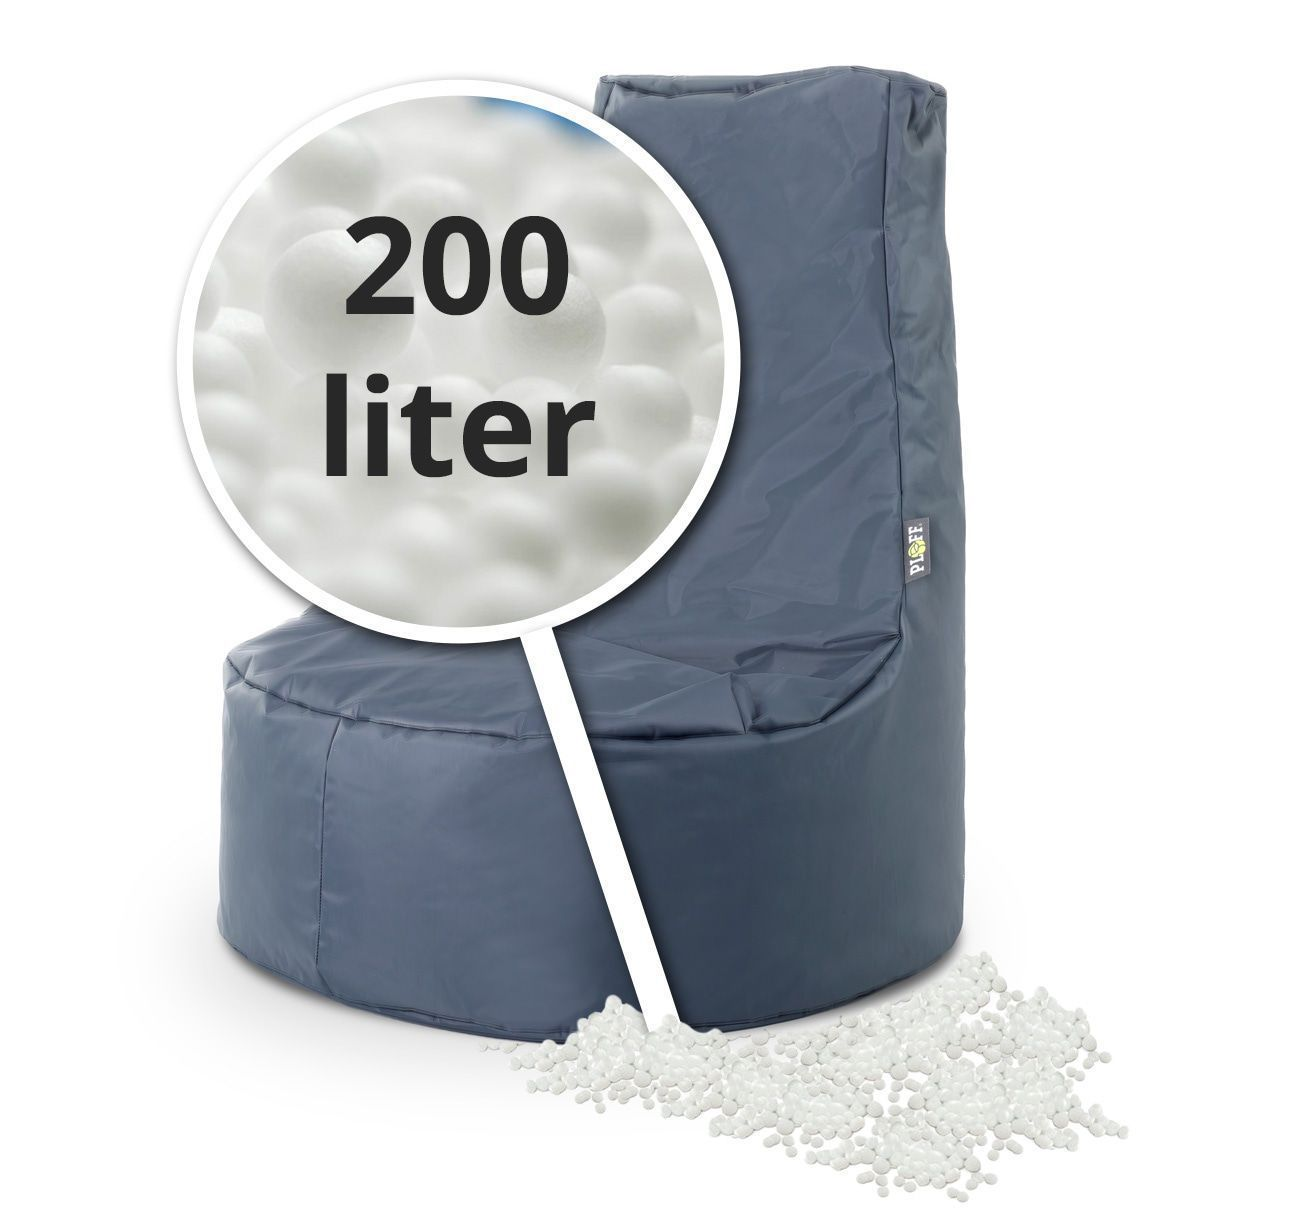 EPS Zitzak navulling 200 liter